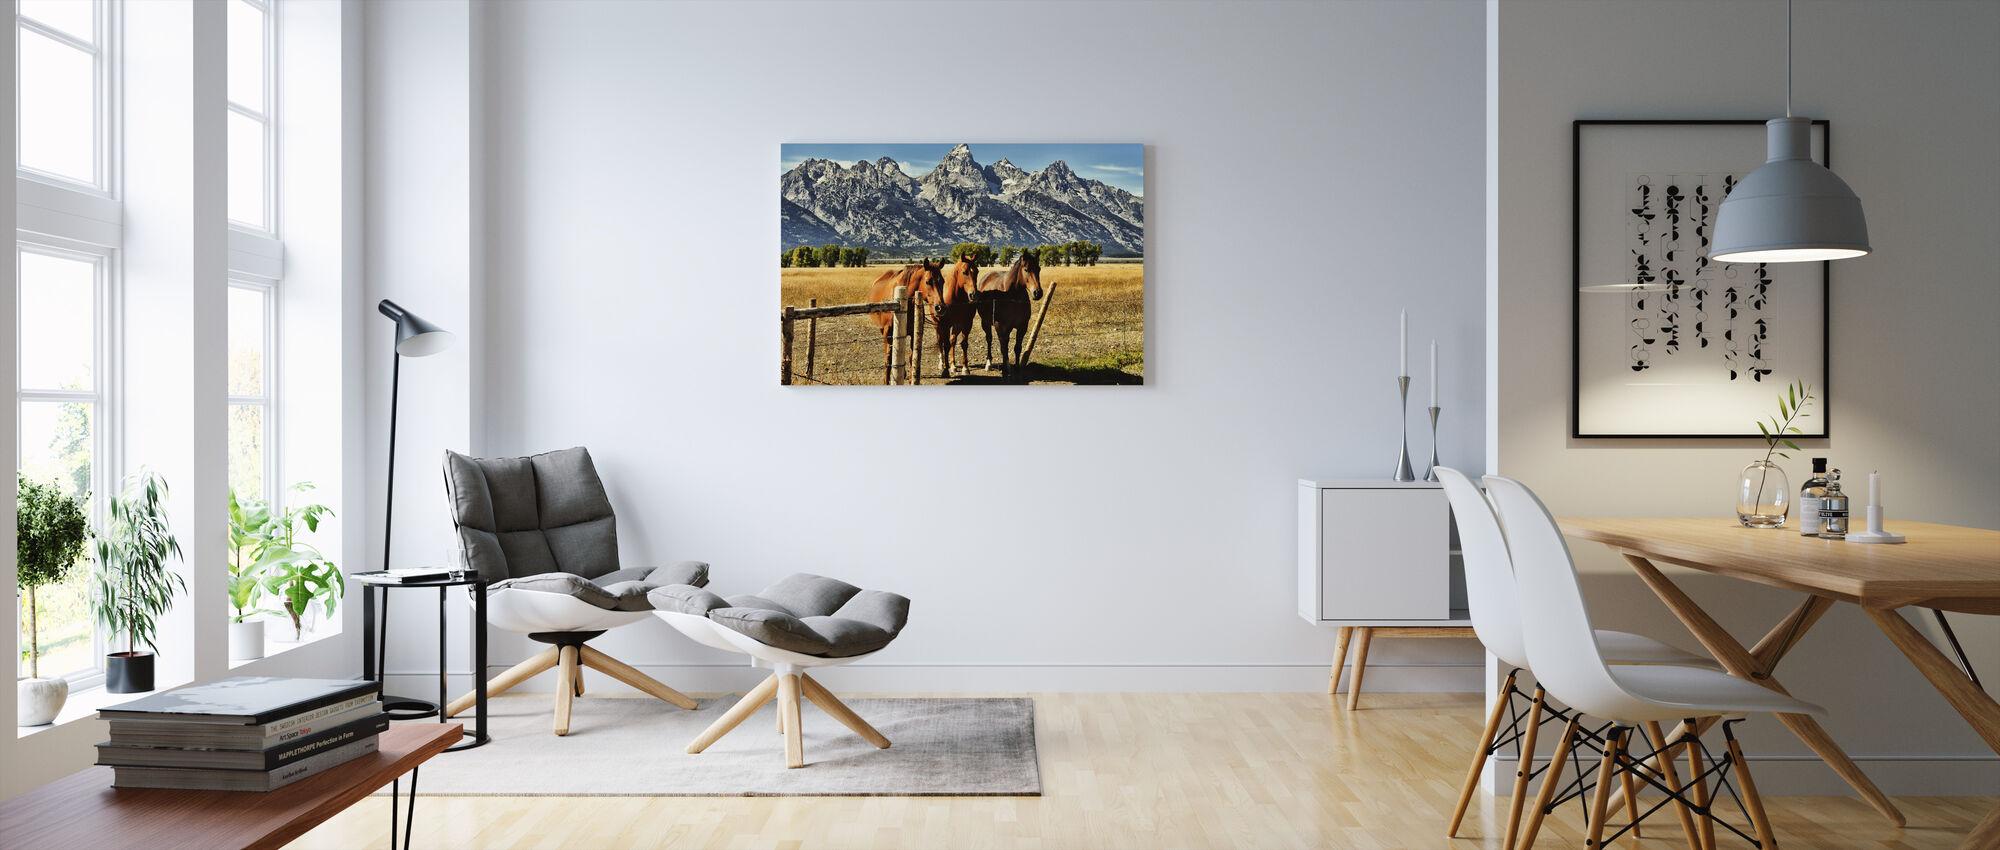 Trio in front of Teton Mountain Range - Canvas print - Living Room